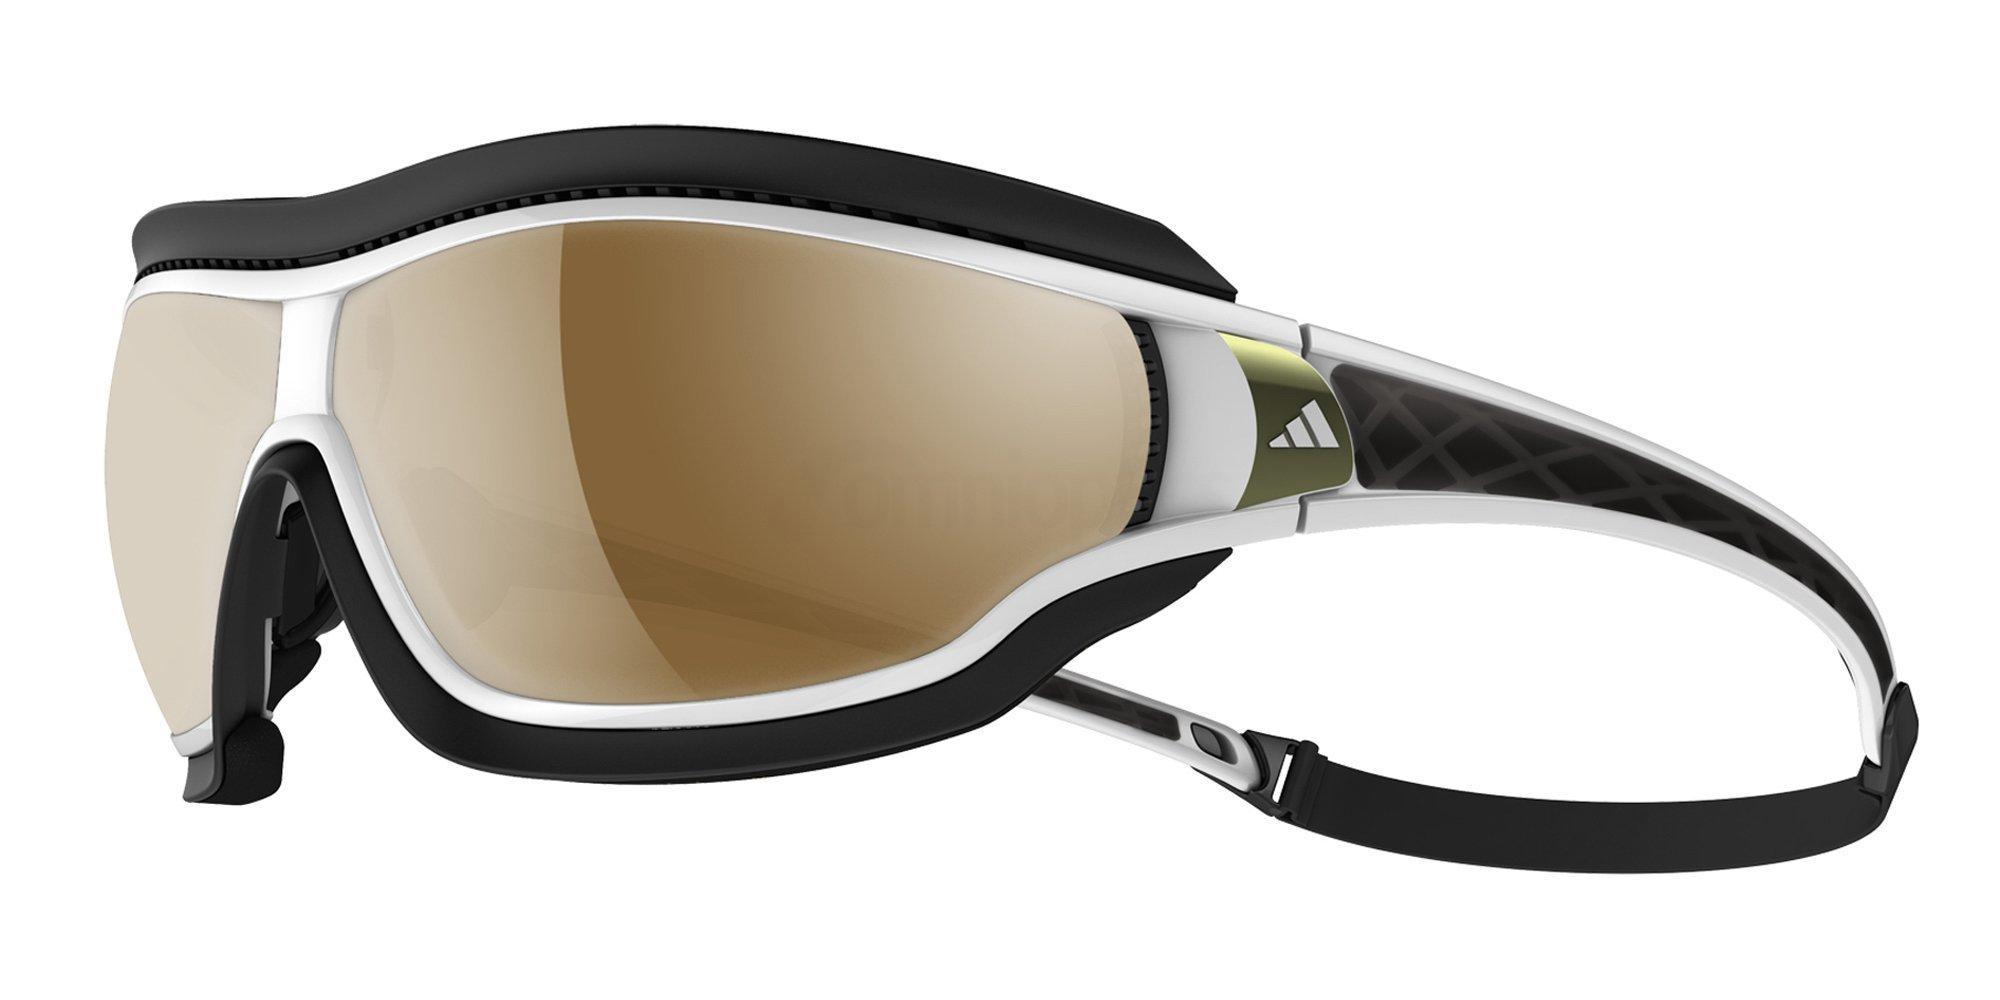 a197 00 6052 a197 Tycane Pro Outdoor S Sunglasses, Adidas